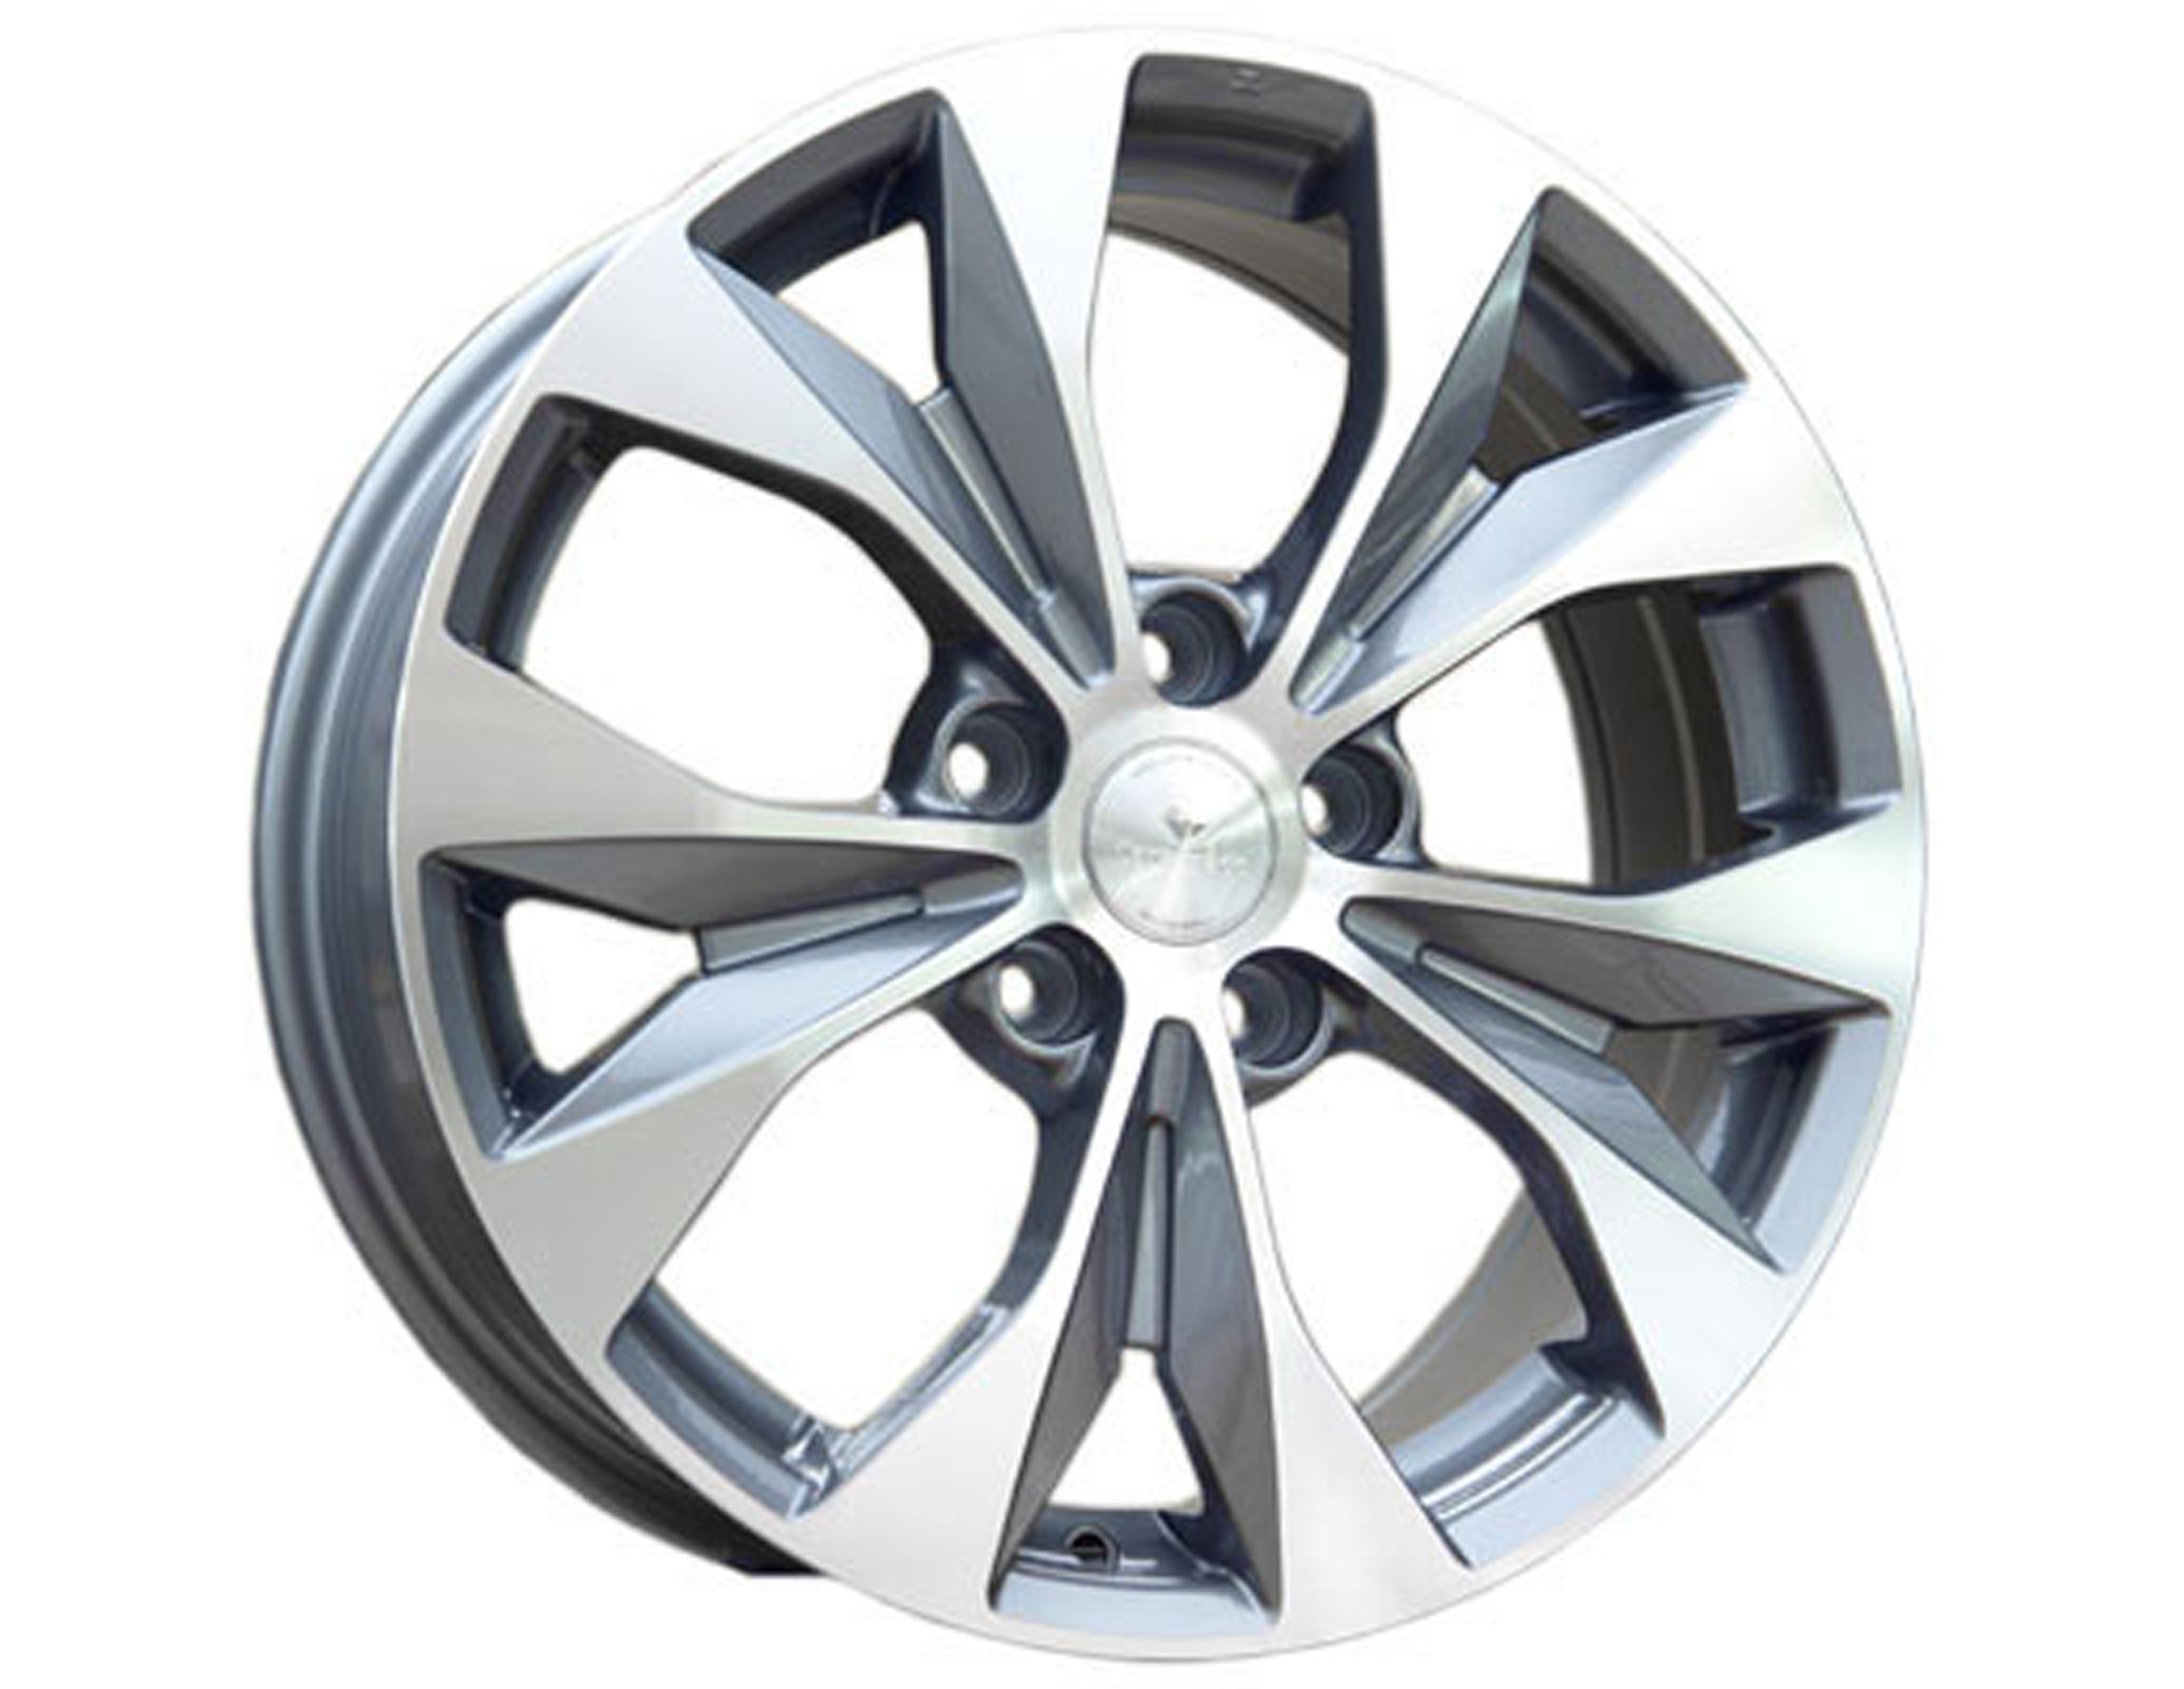 Felgi Aluminiowe Rose 17 5x1143 Kia Venga Fv 6921324622